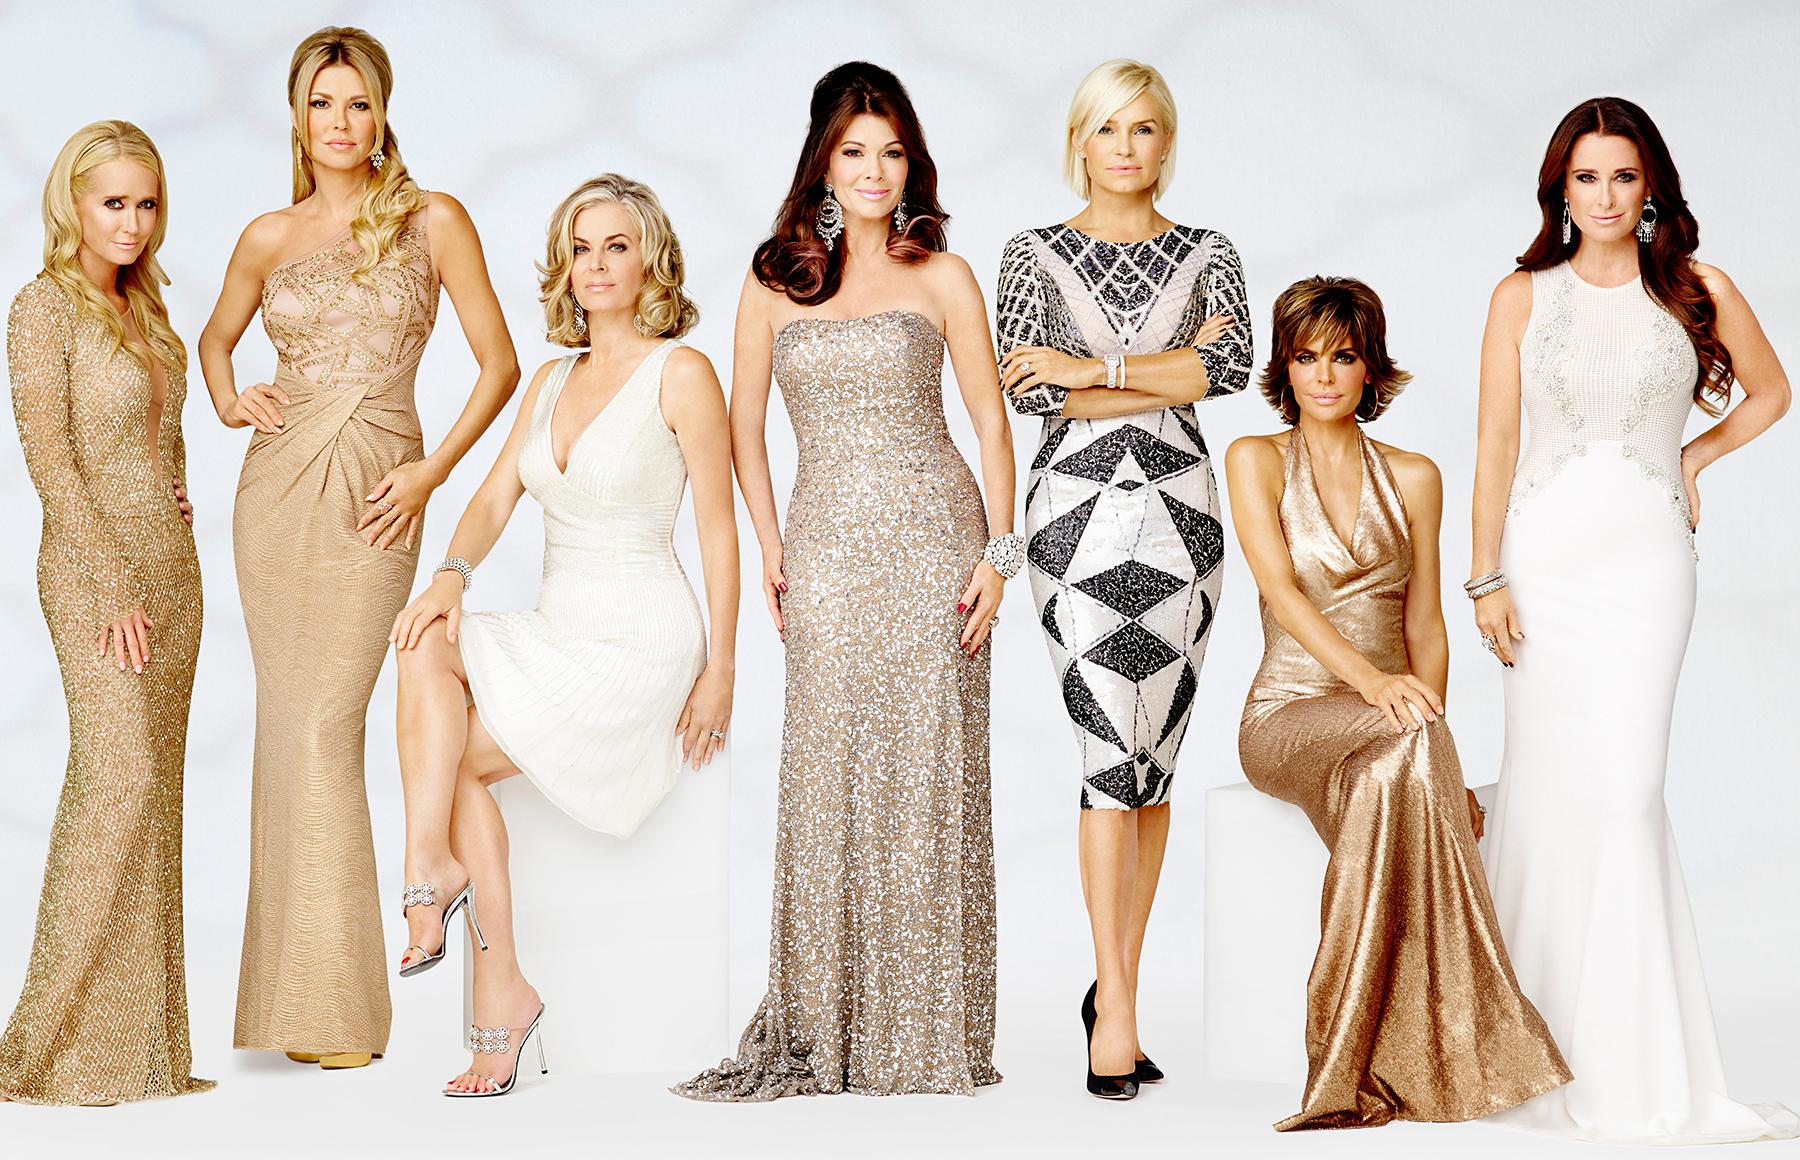 RHOBH-season 5 cast